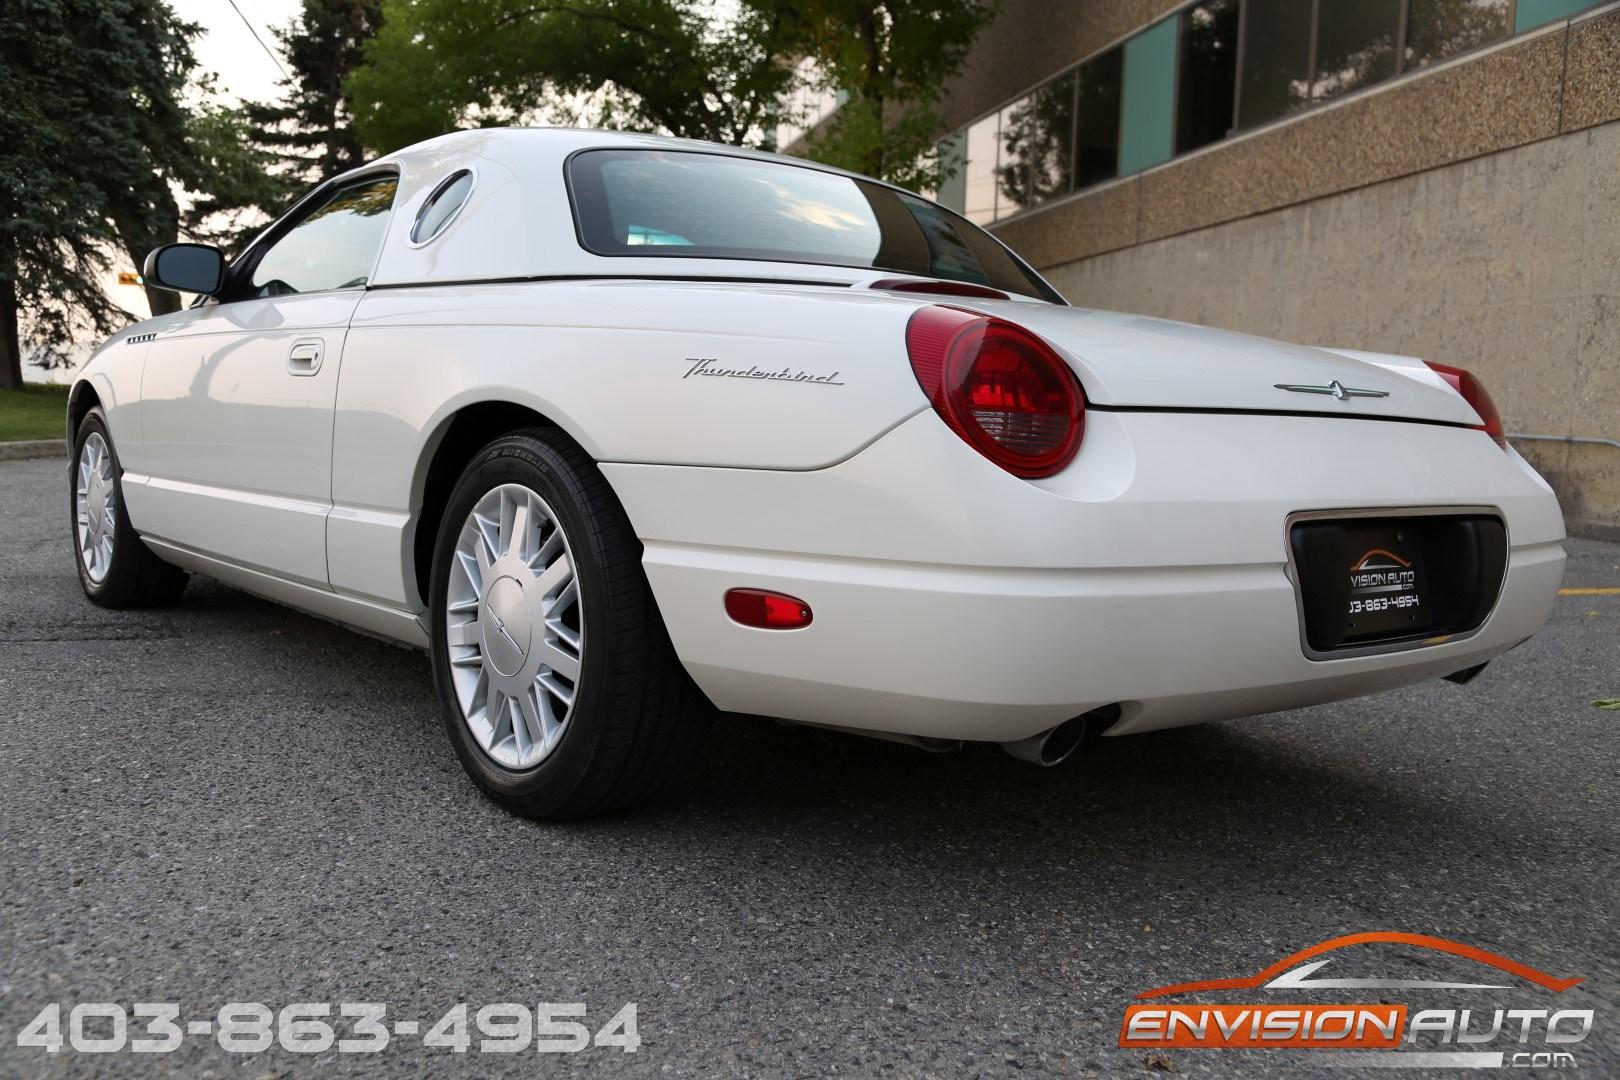 2002 Ford Thunderbird Convertible Envision Auto